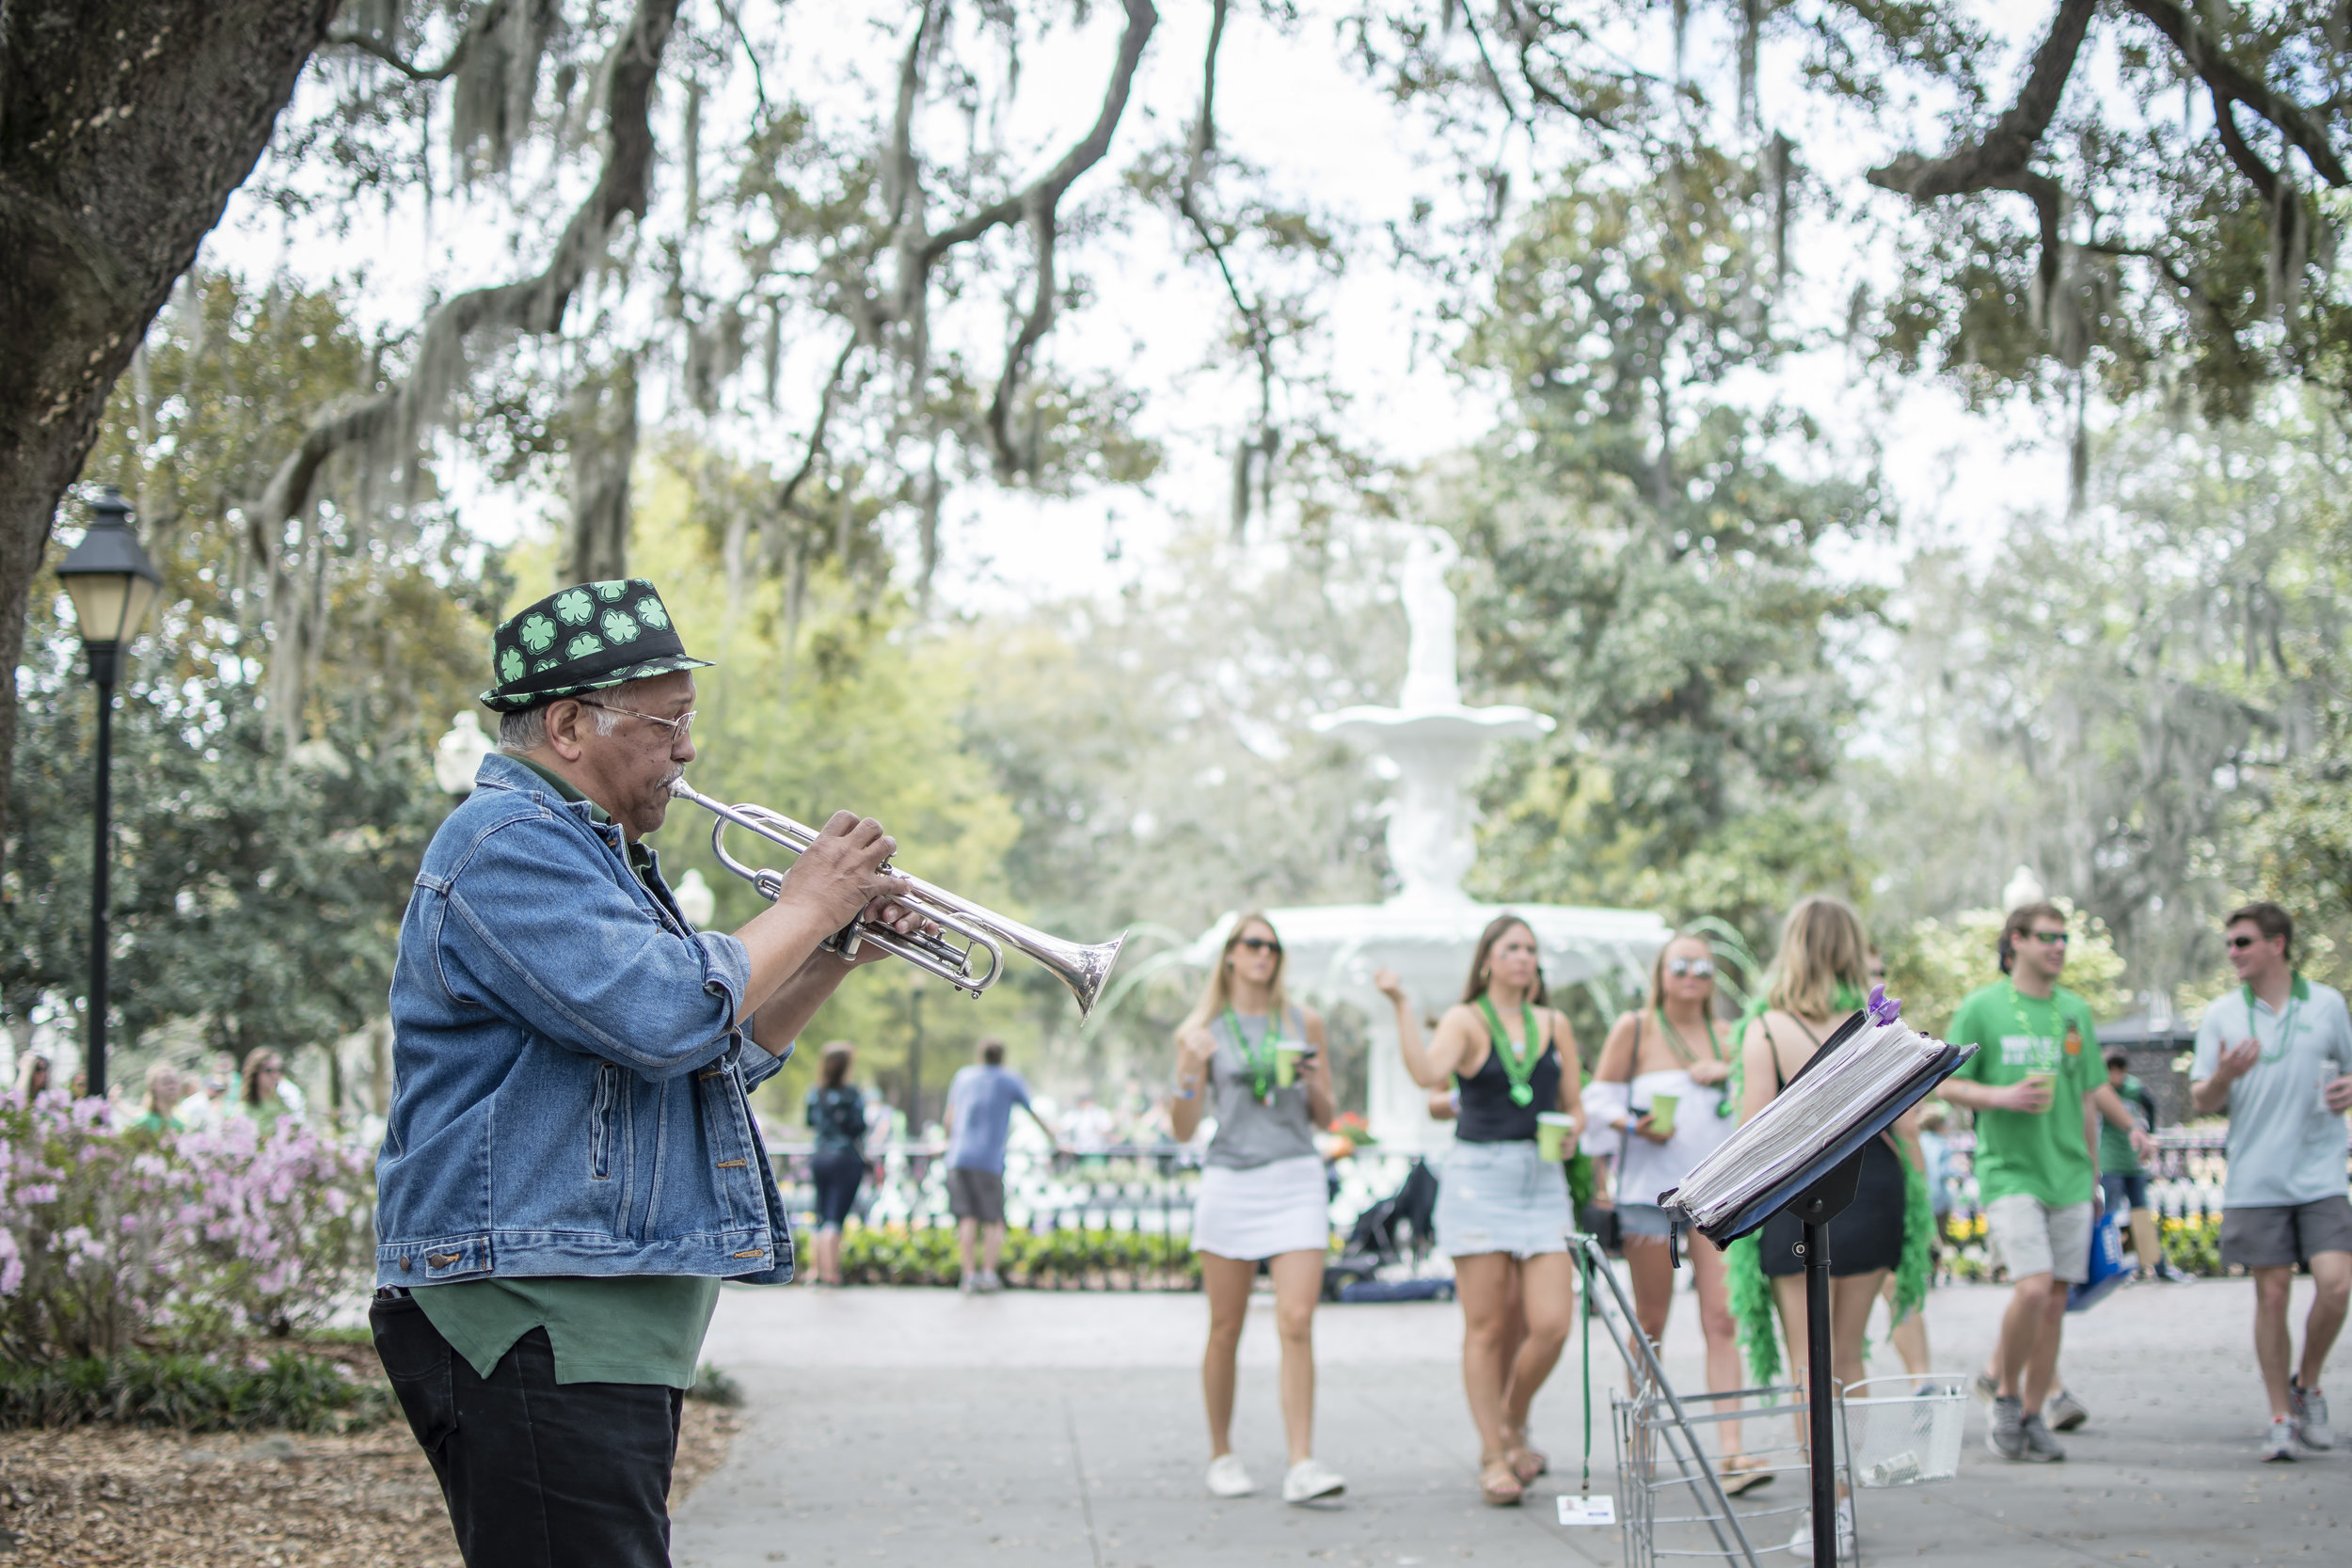 The St. Patrick's Day celebration in Savannah, GA was in full swing!